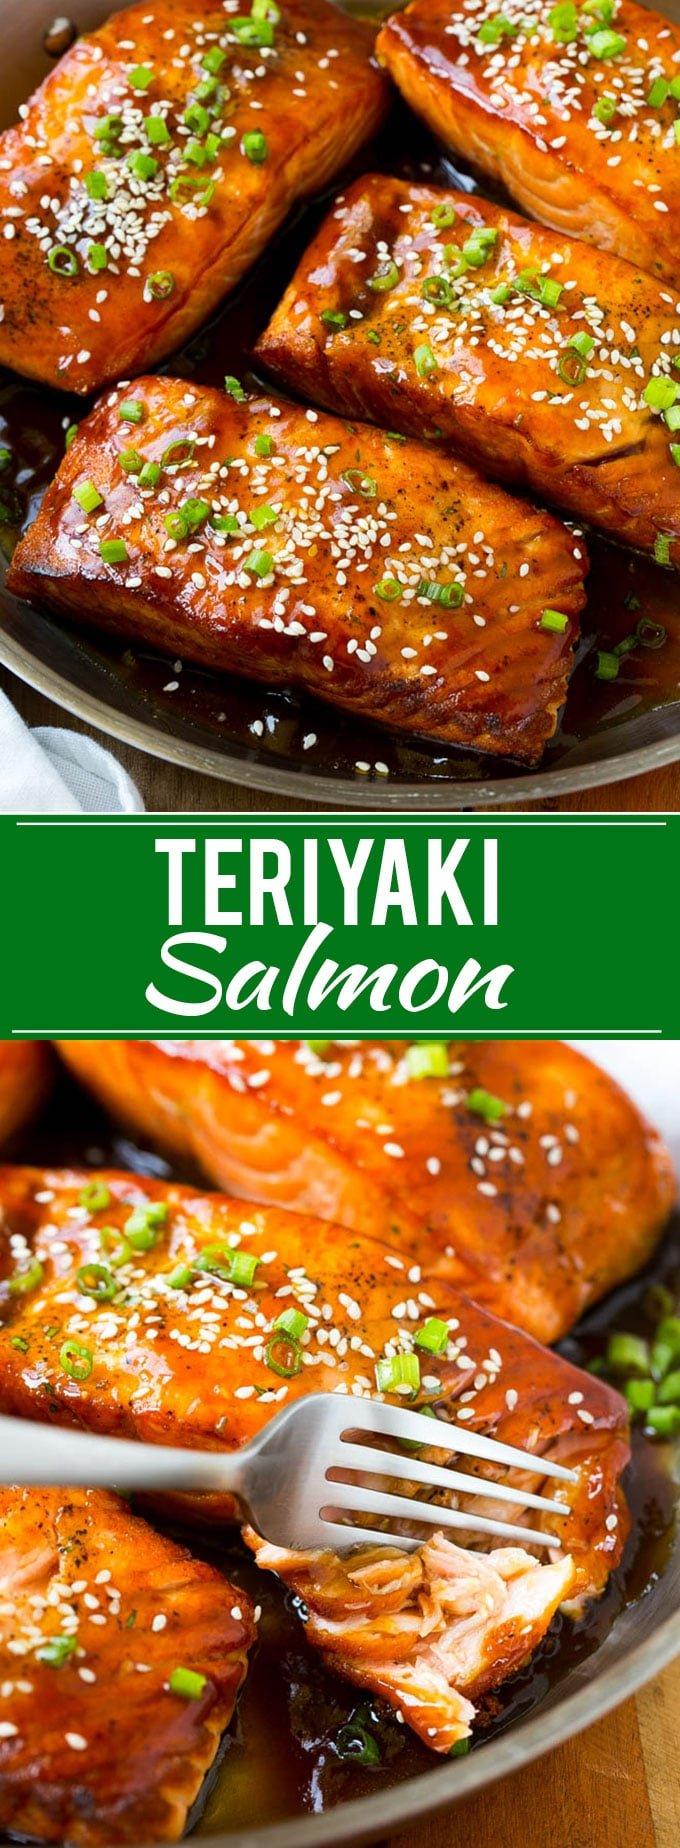 Salmon Teriyaki Recipe | Easy Salmon Recipe | Asian Salmon | Teriyaki Recipe